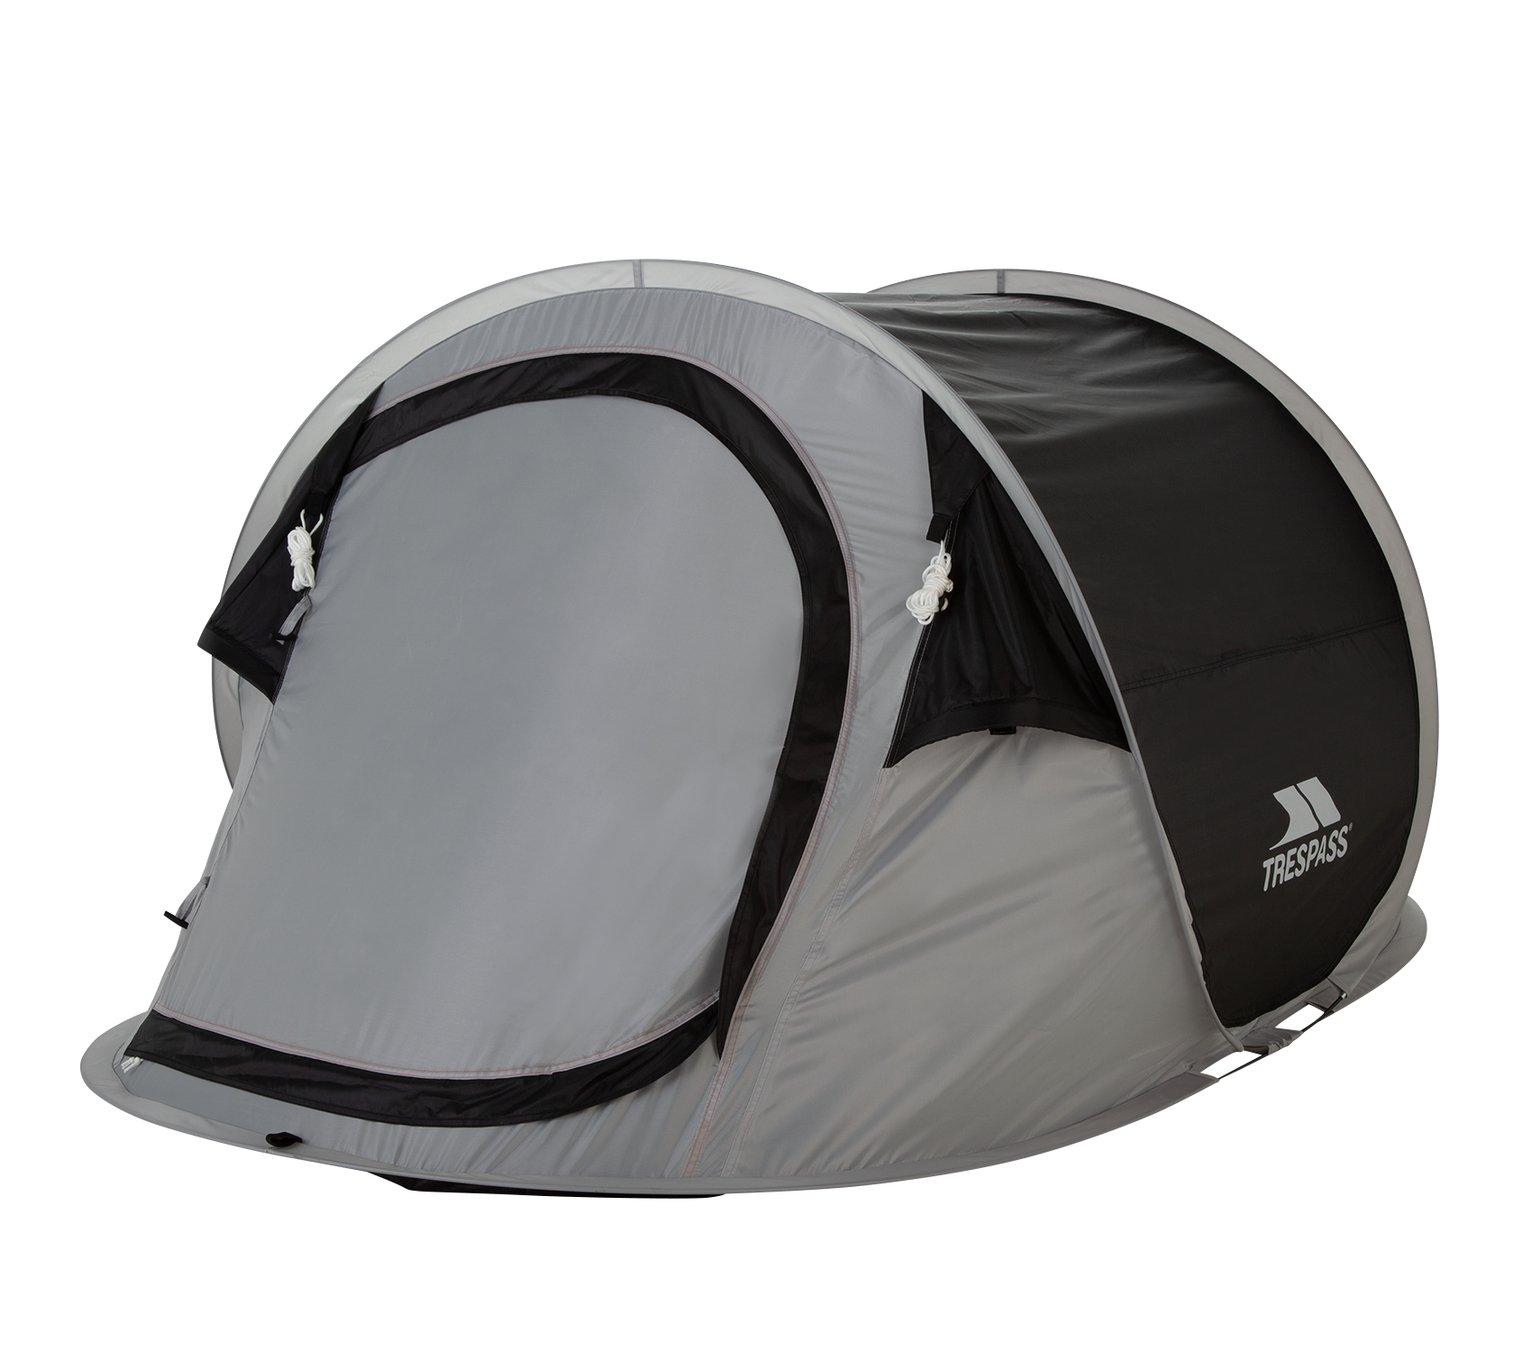 Trespass 2 Man 1 Room Festival Pop Up Tent Black  sc 1 st  Argos & Tents | Argos